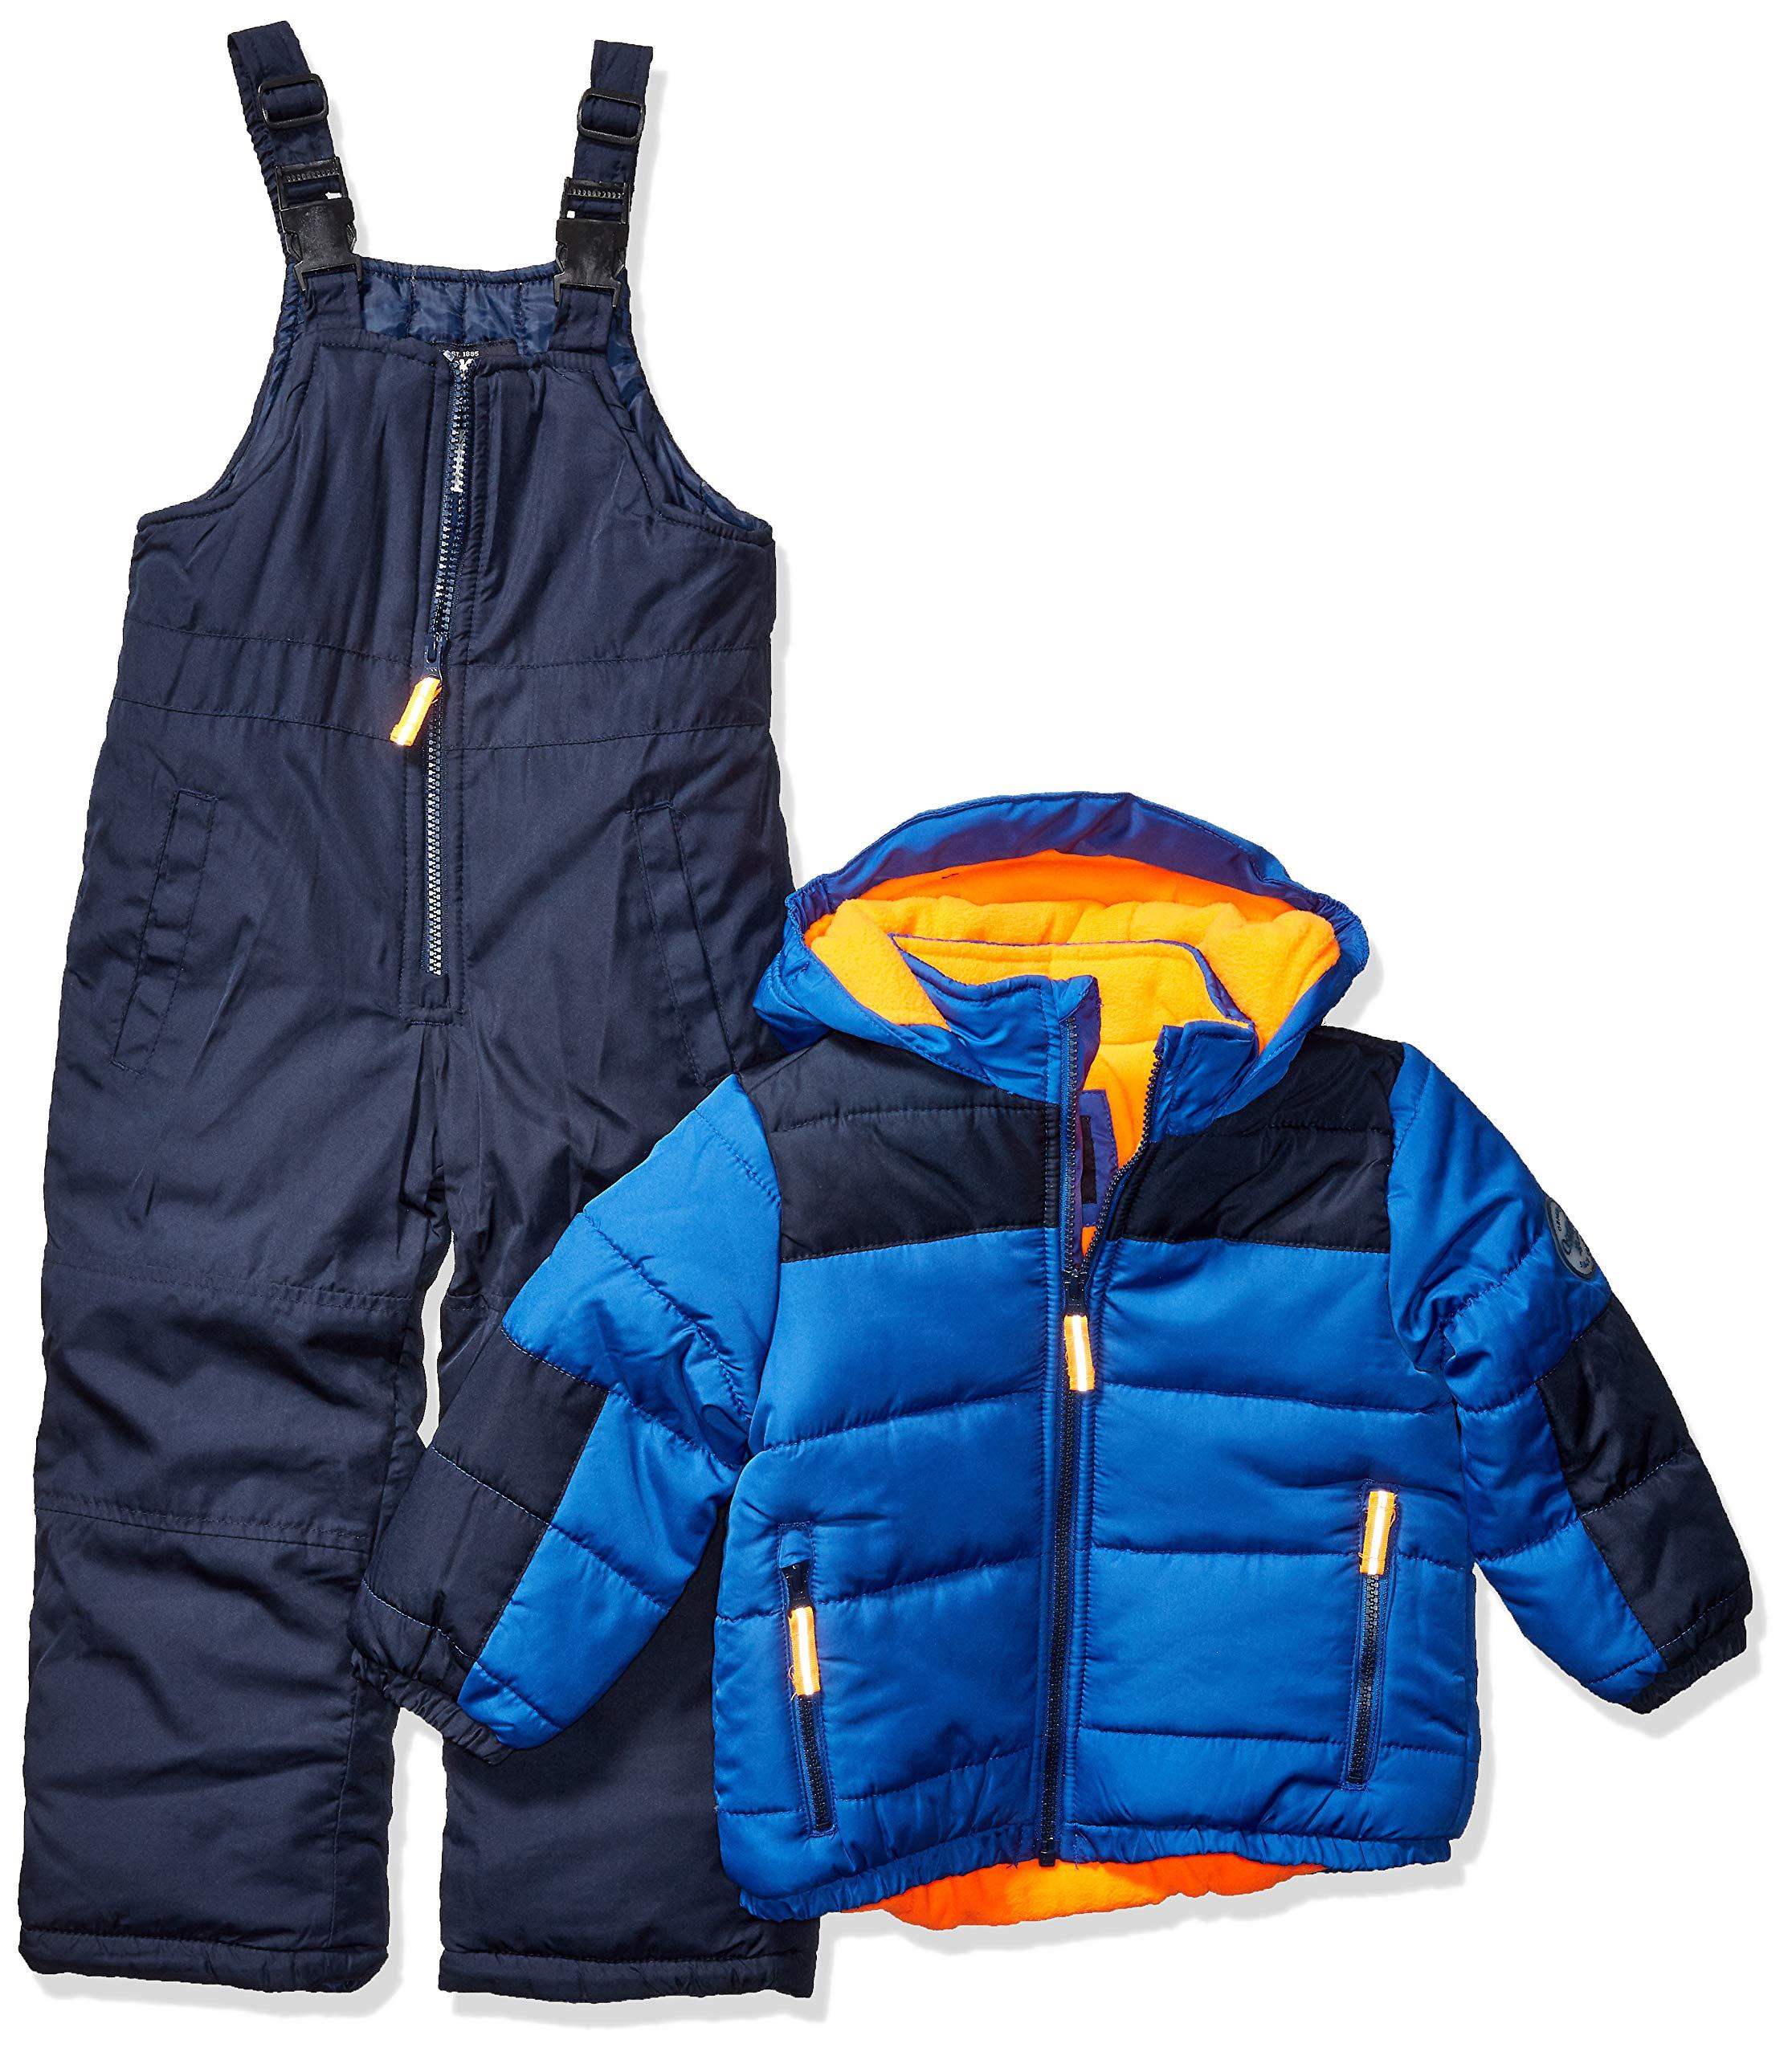 Osh Kosh Boys' Little Ski Jacket and Snowbib Snowsuit Set, Wedgewood Blue/Deep Navy, 7 by OshKosh B'Gosh